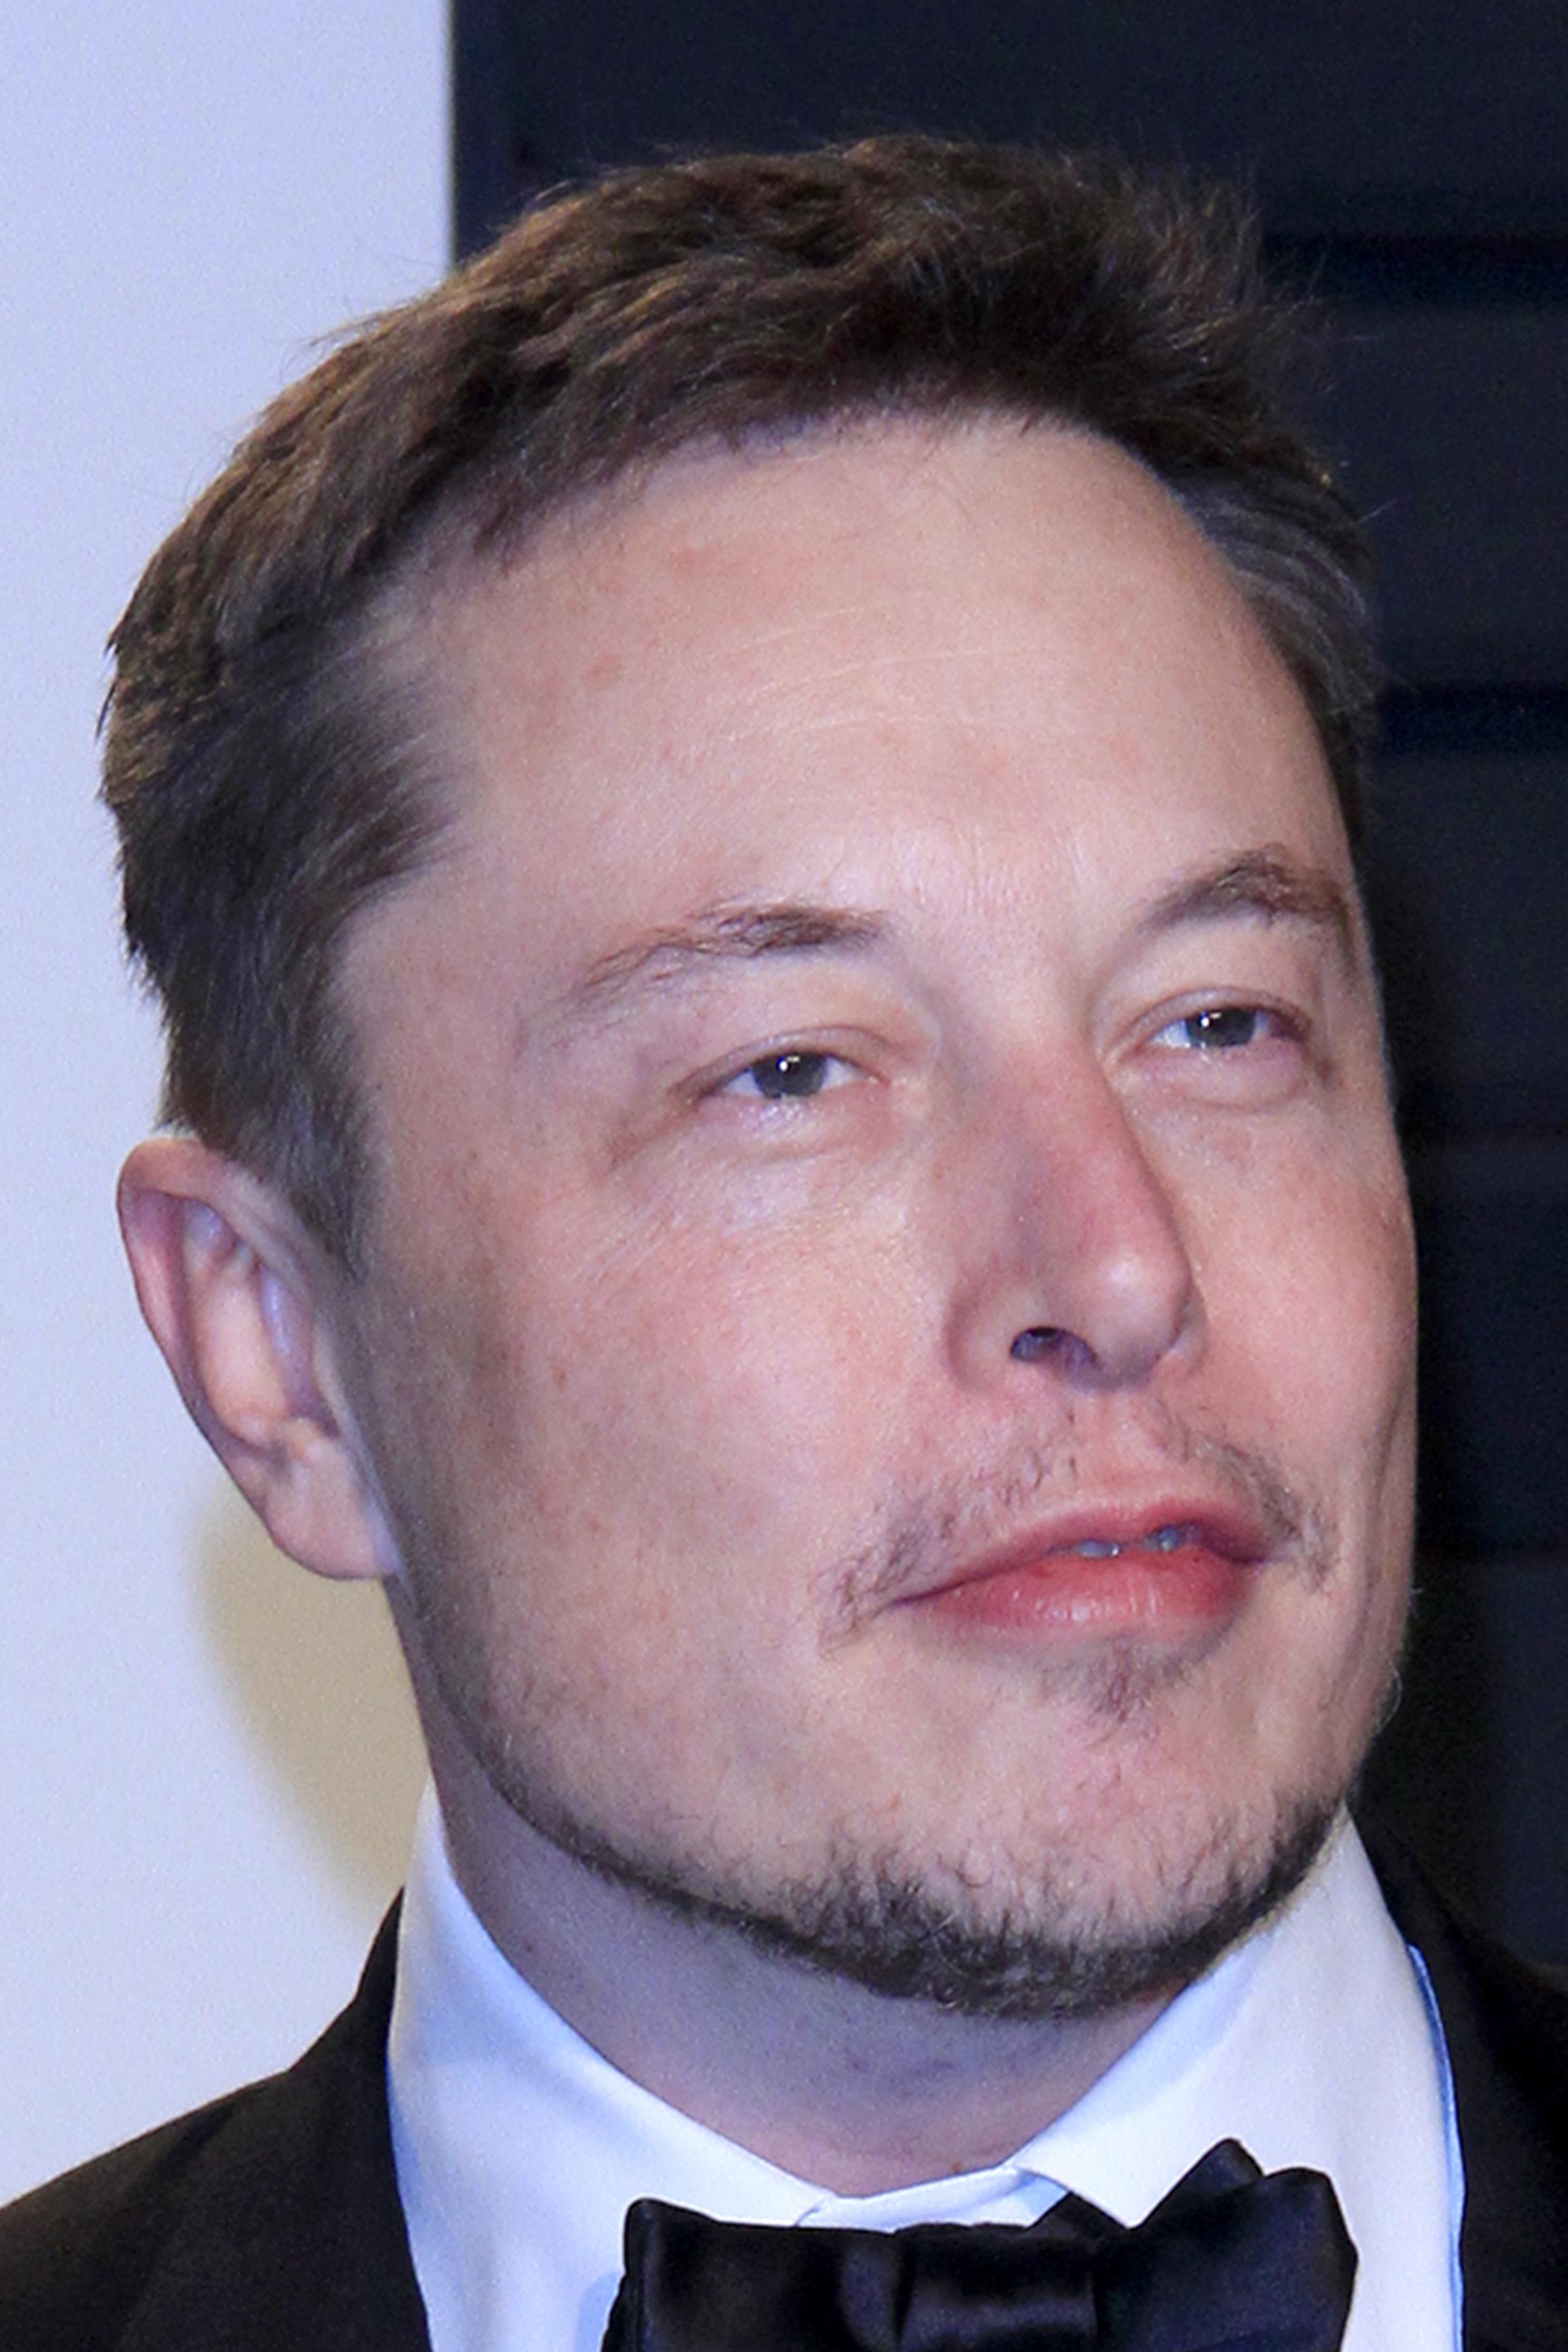 Elon Musk Life Story